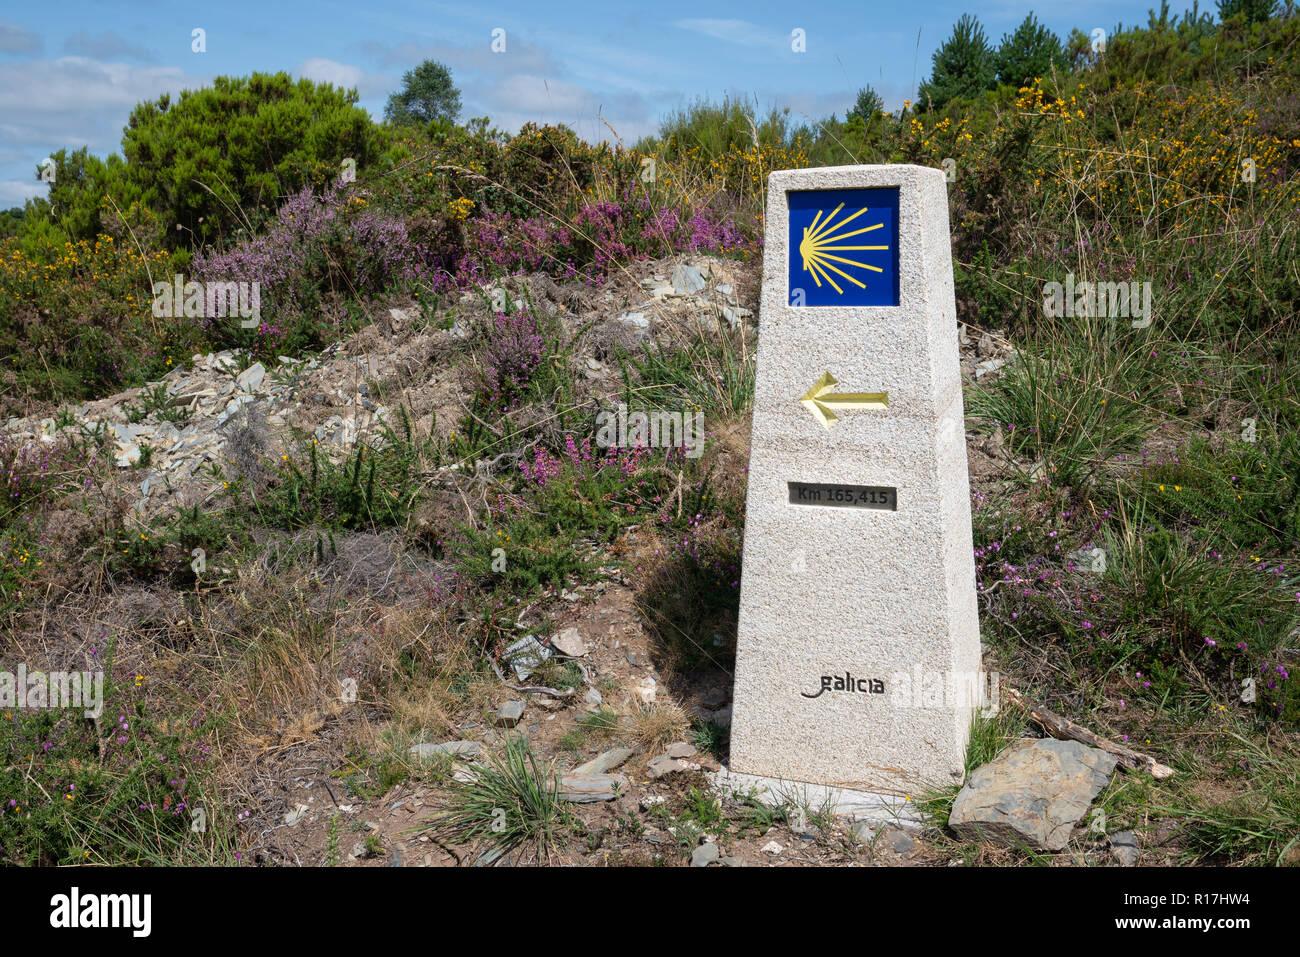 Waymark along the Camino Primitivo, Spain, Europe - Stock Image